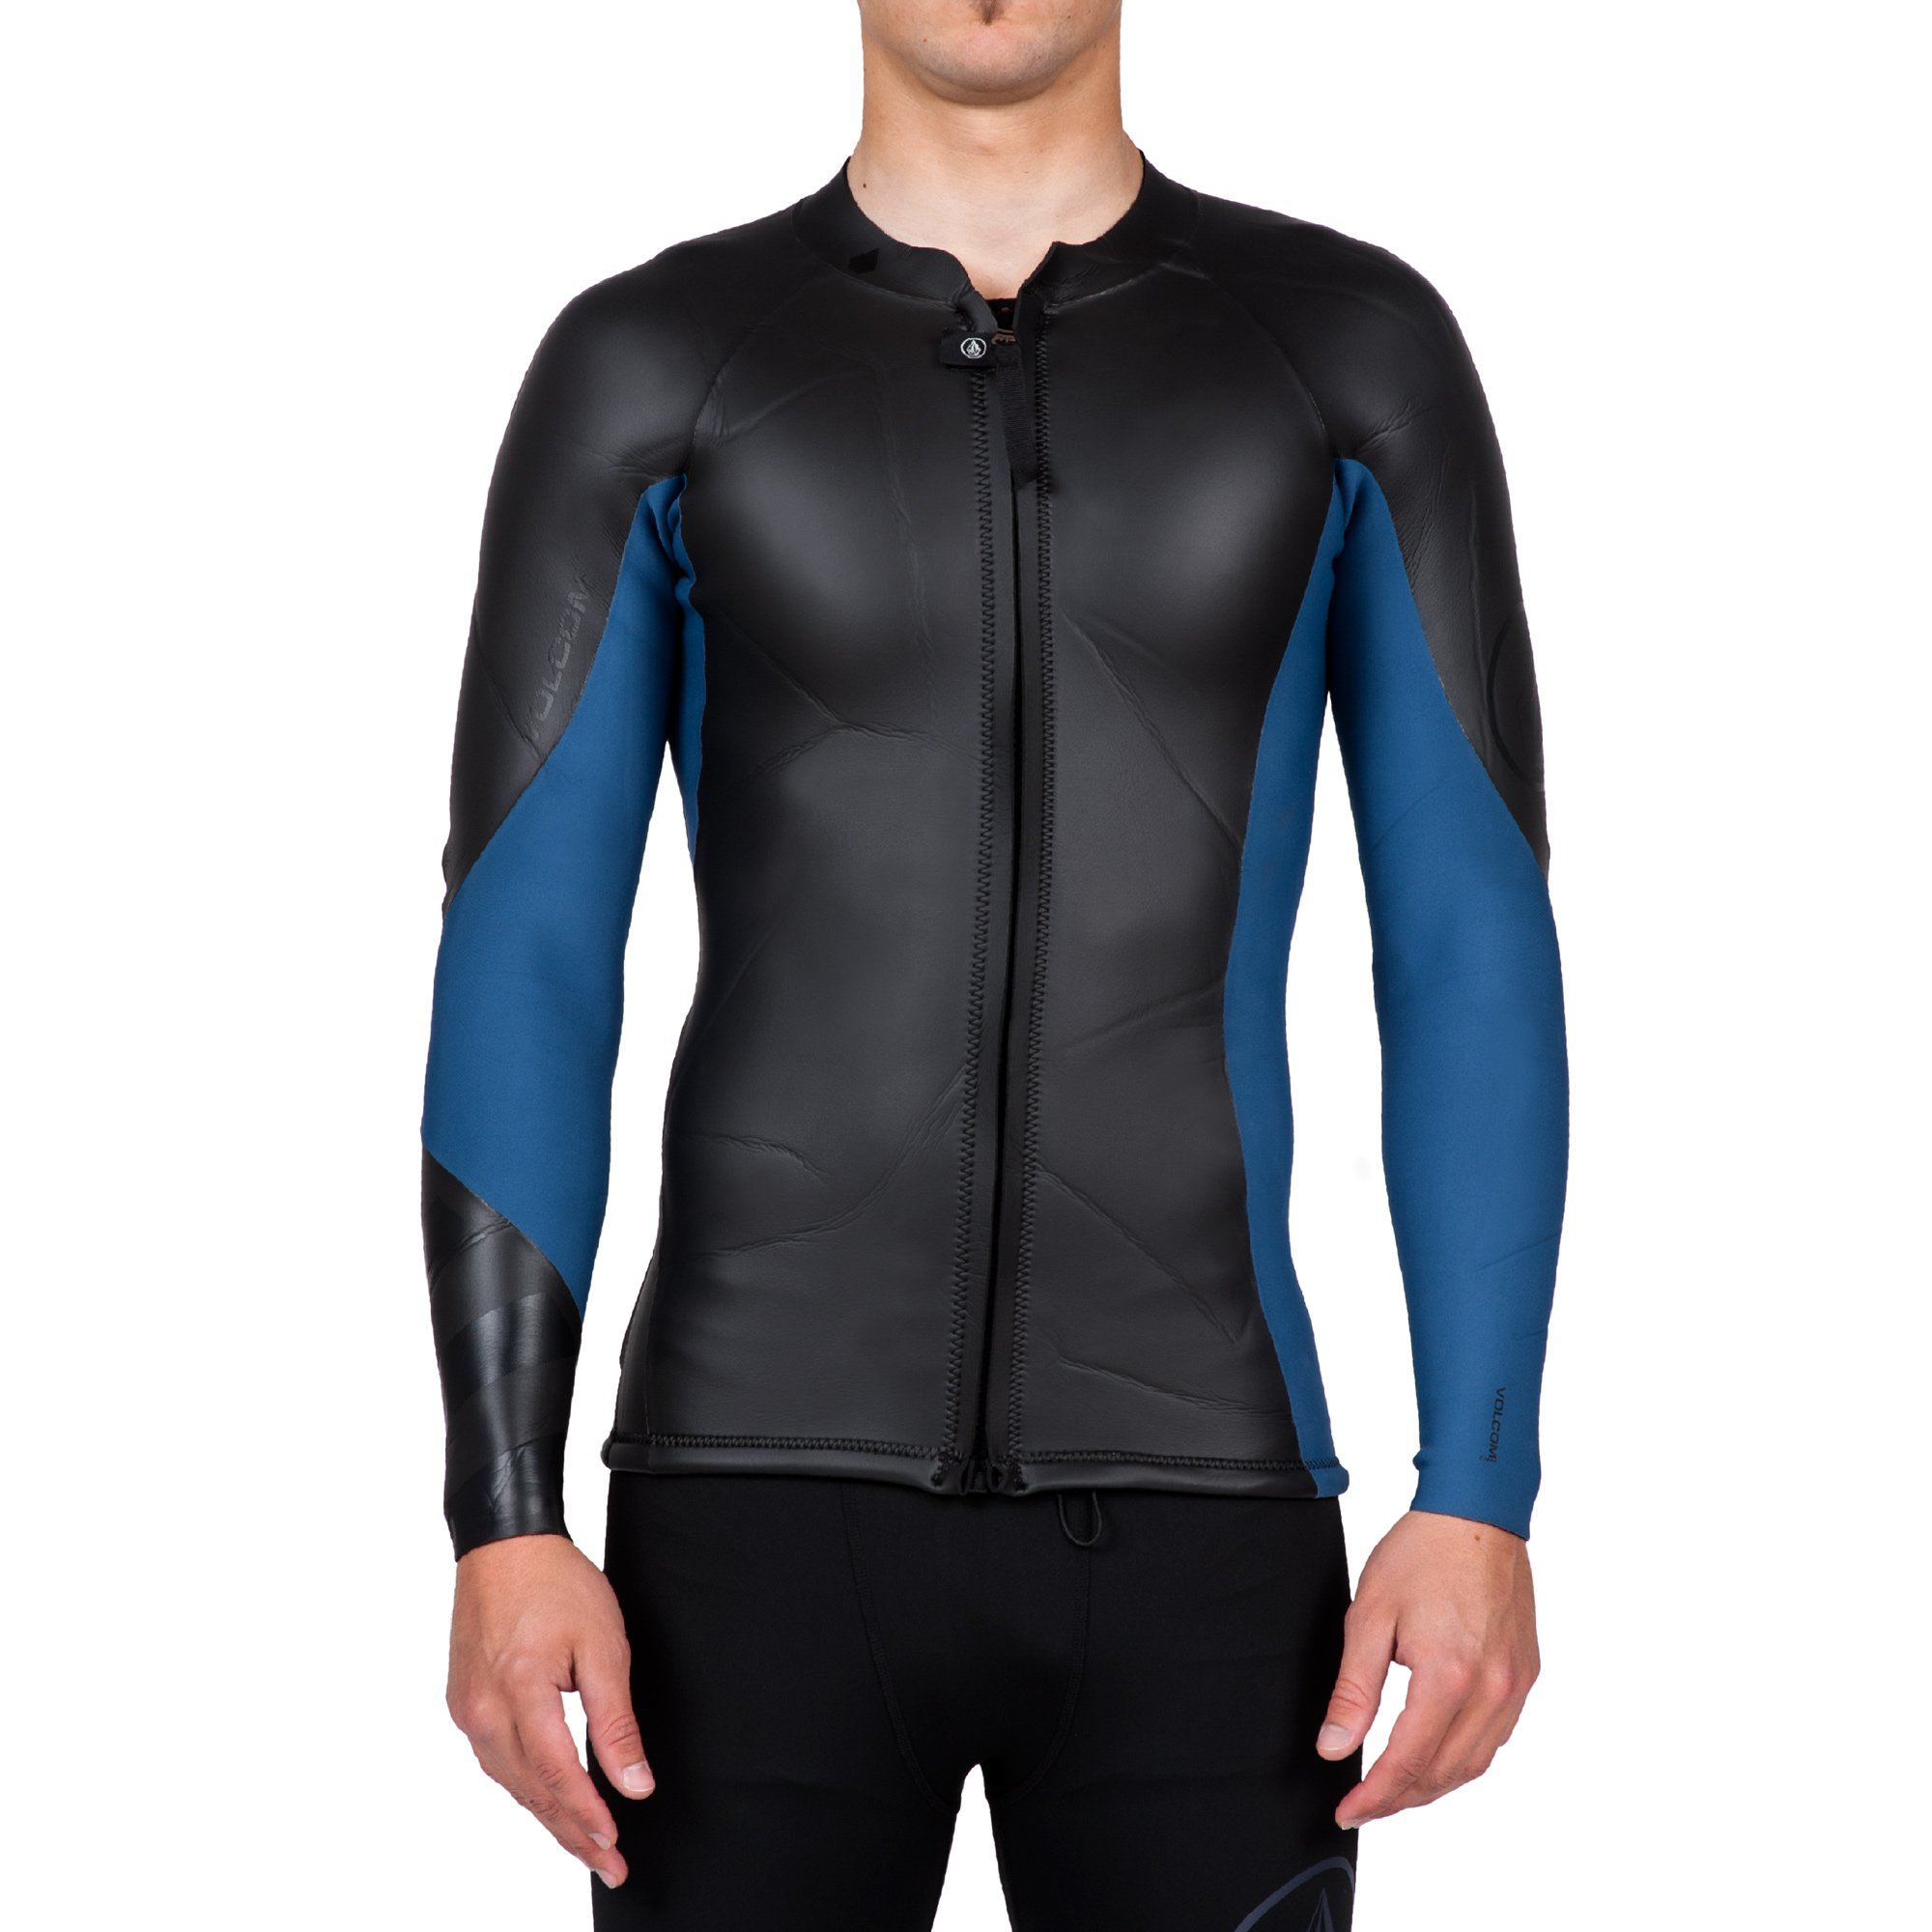 Volcom Men's Lefty Front Zip Jacket, Black, Medium by Volcom